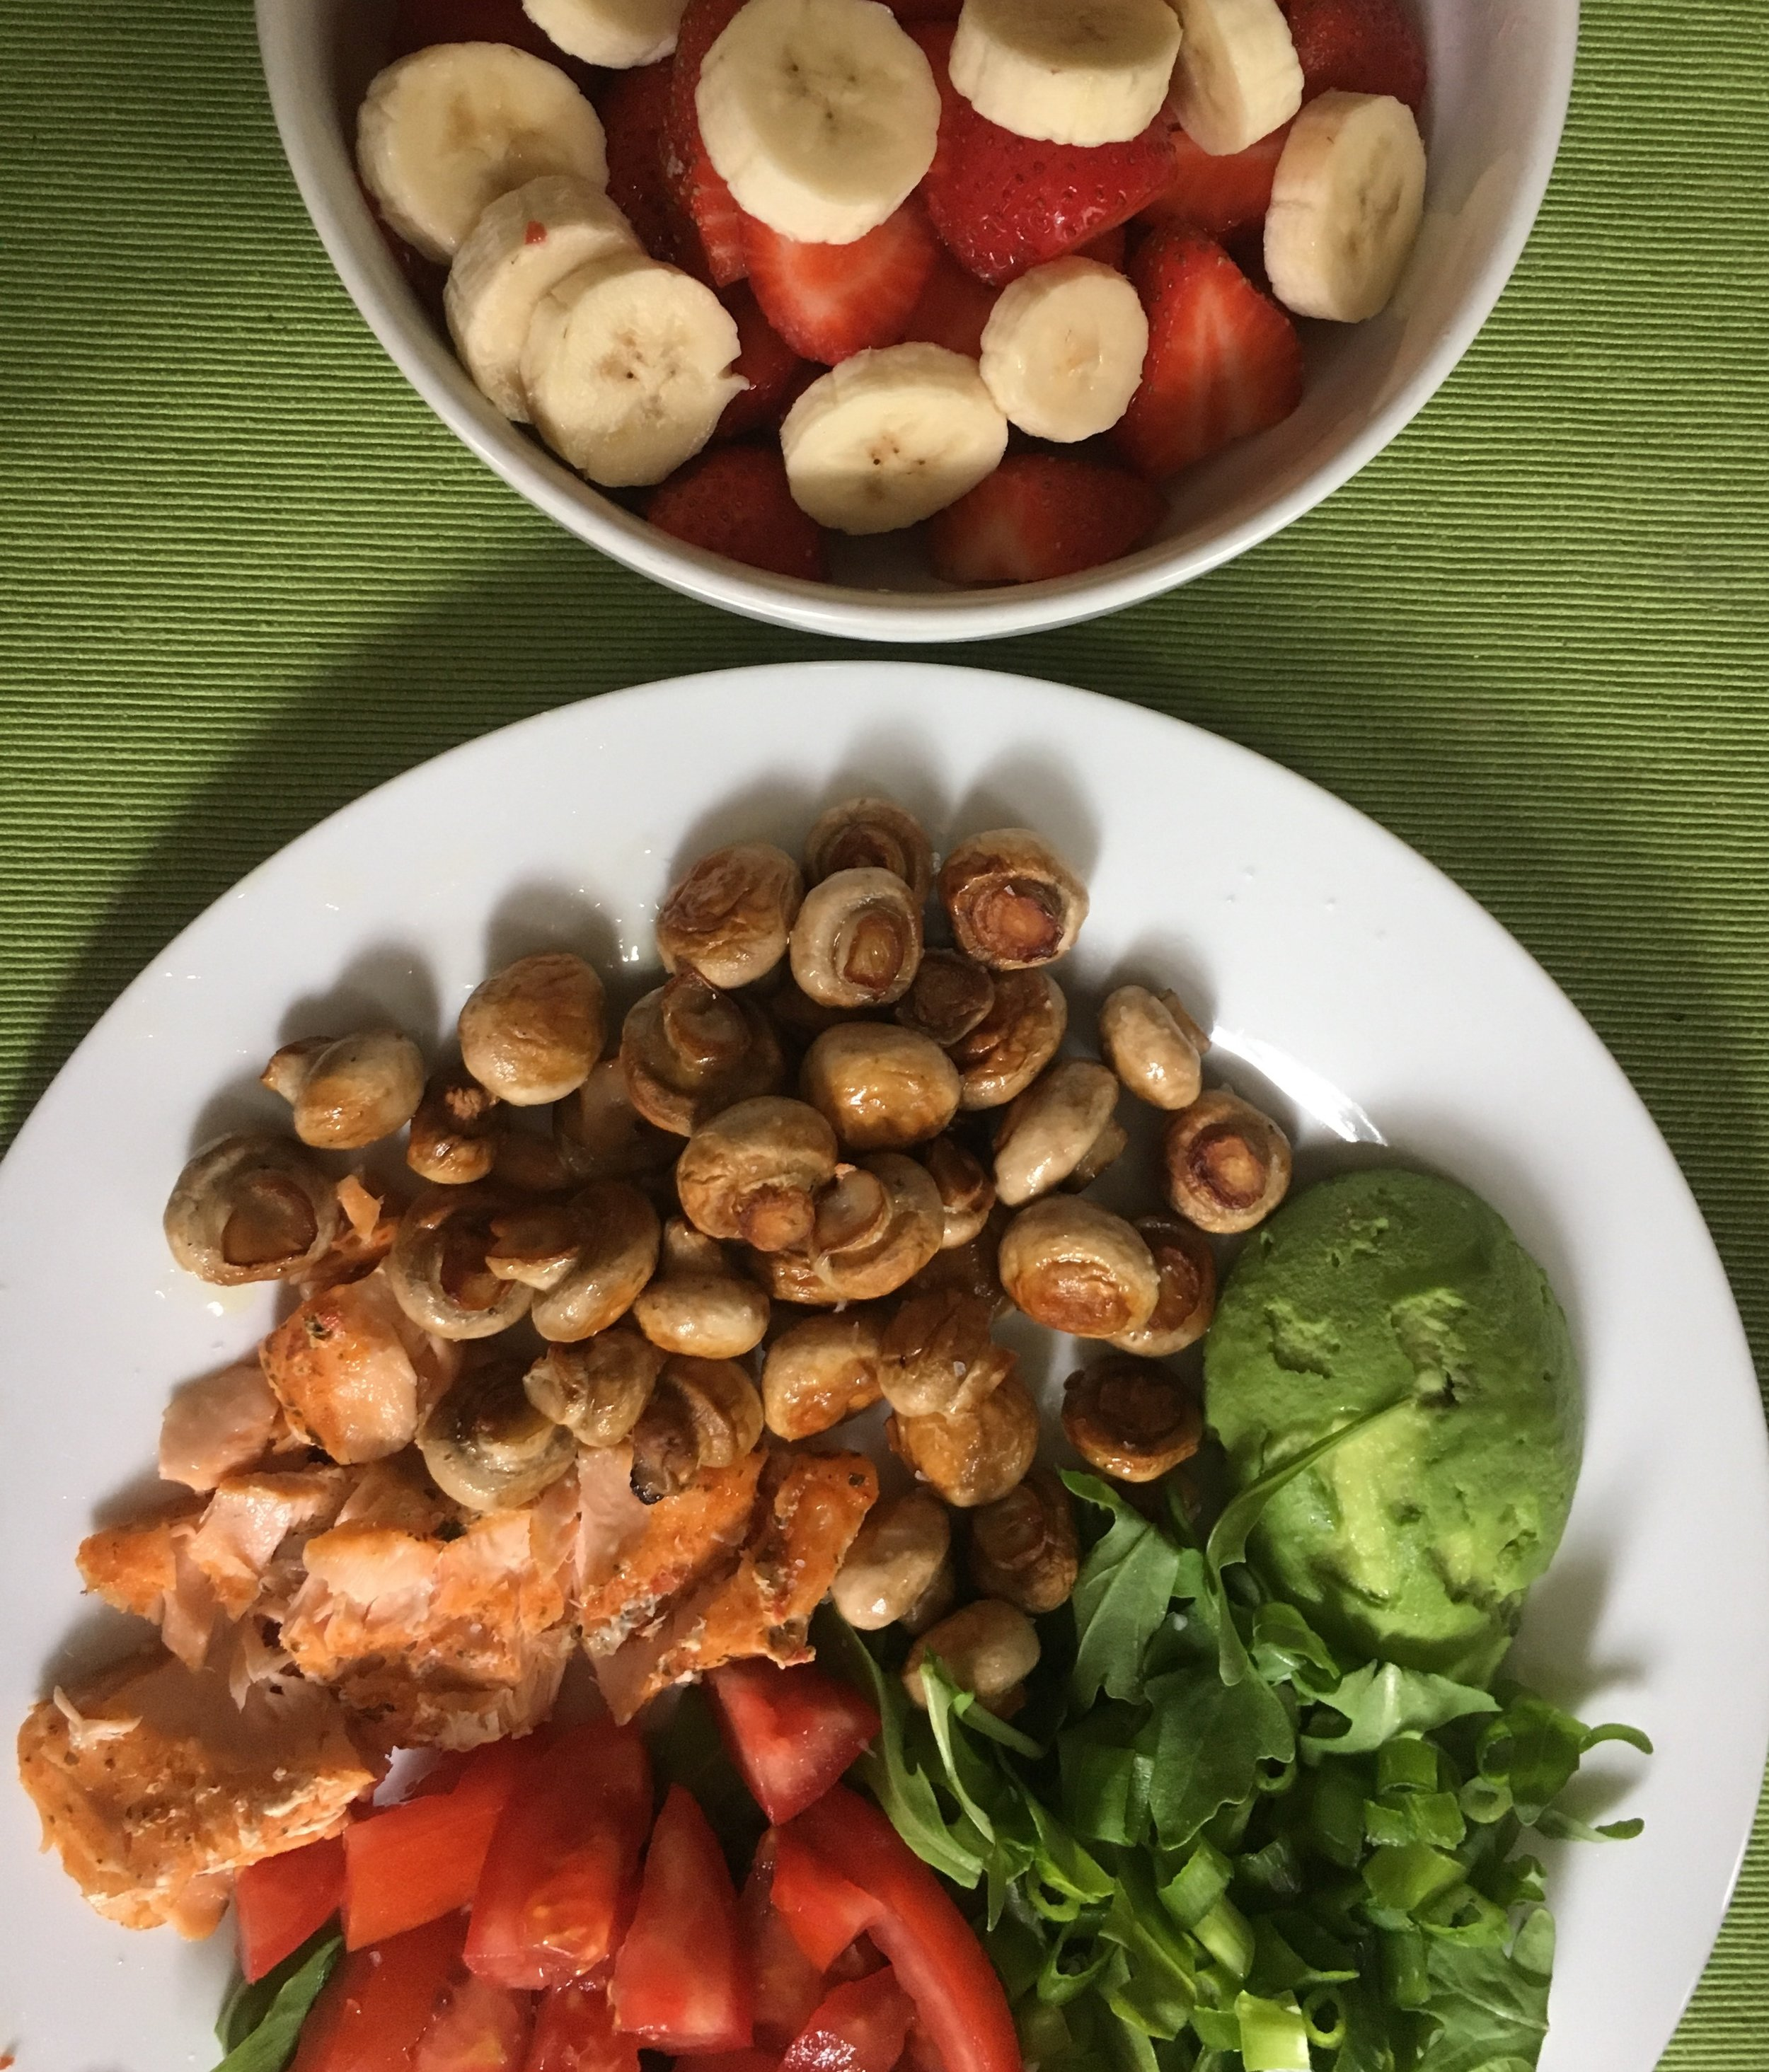 Salmon, tomato, rocket, avocado, mushroom with banana and strawberries as desert ;)